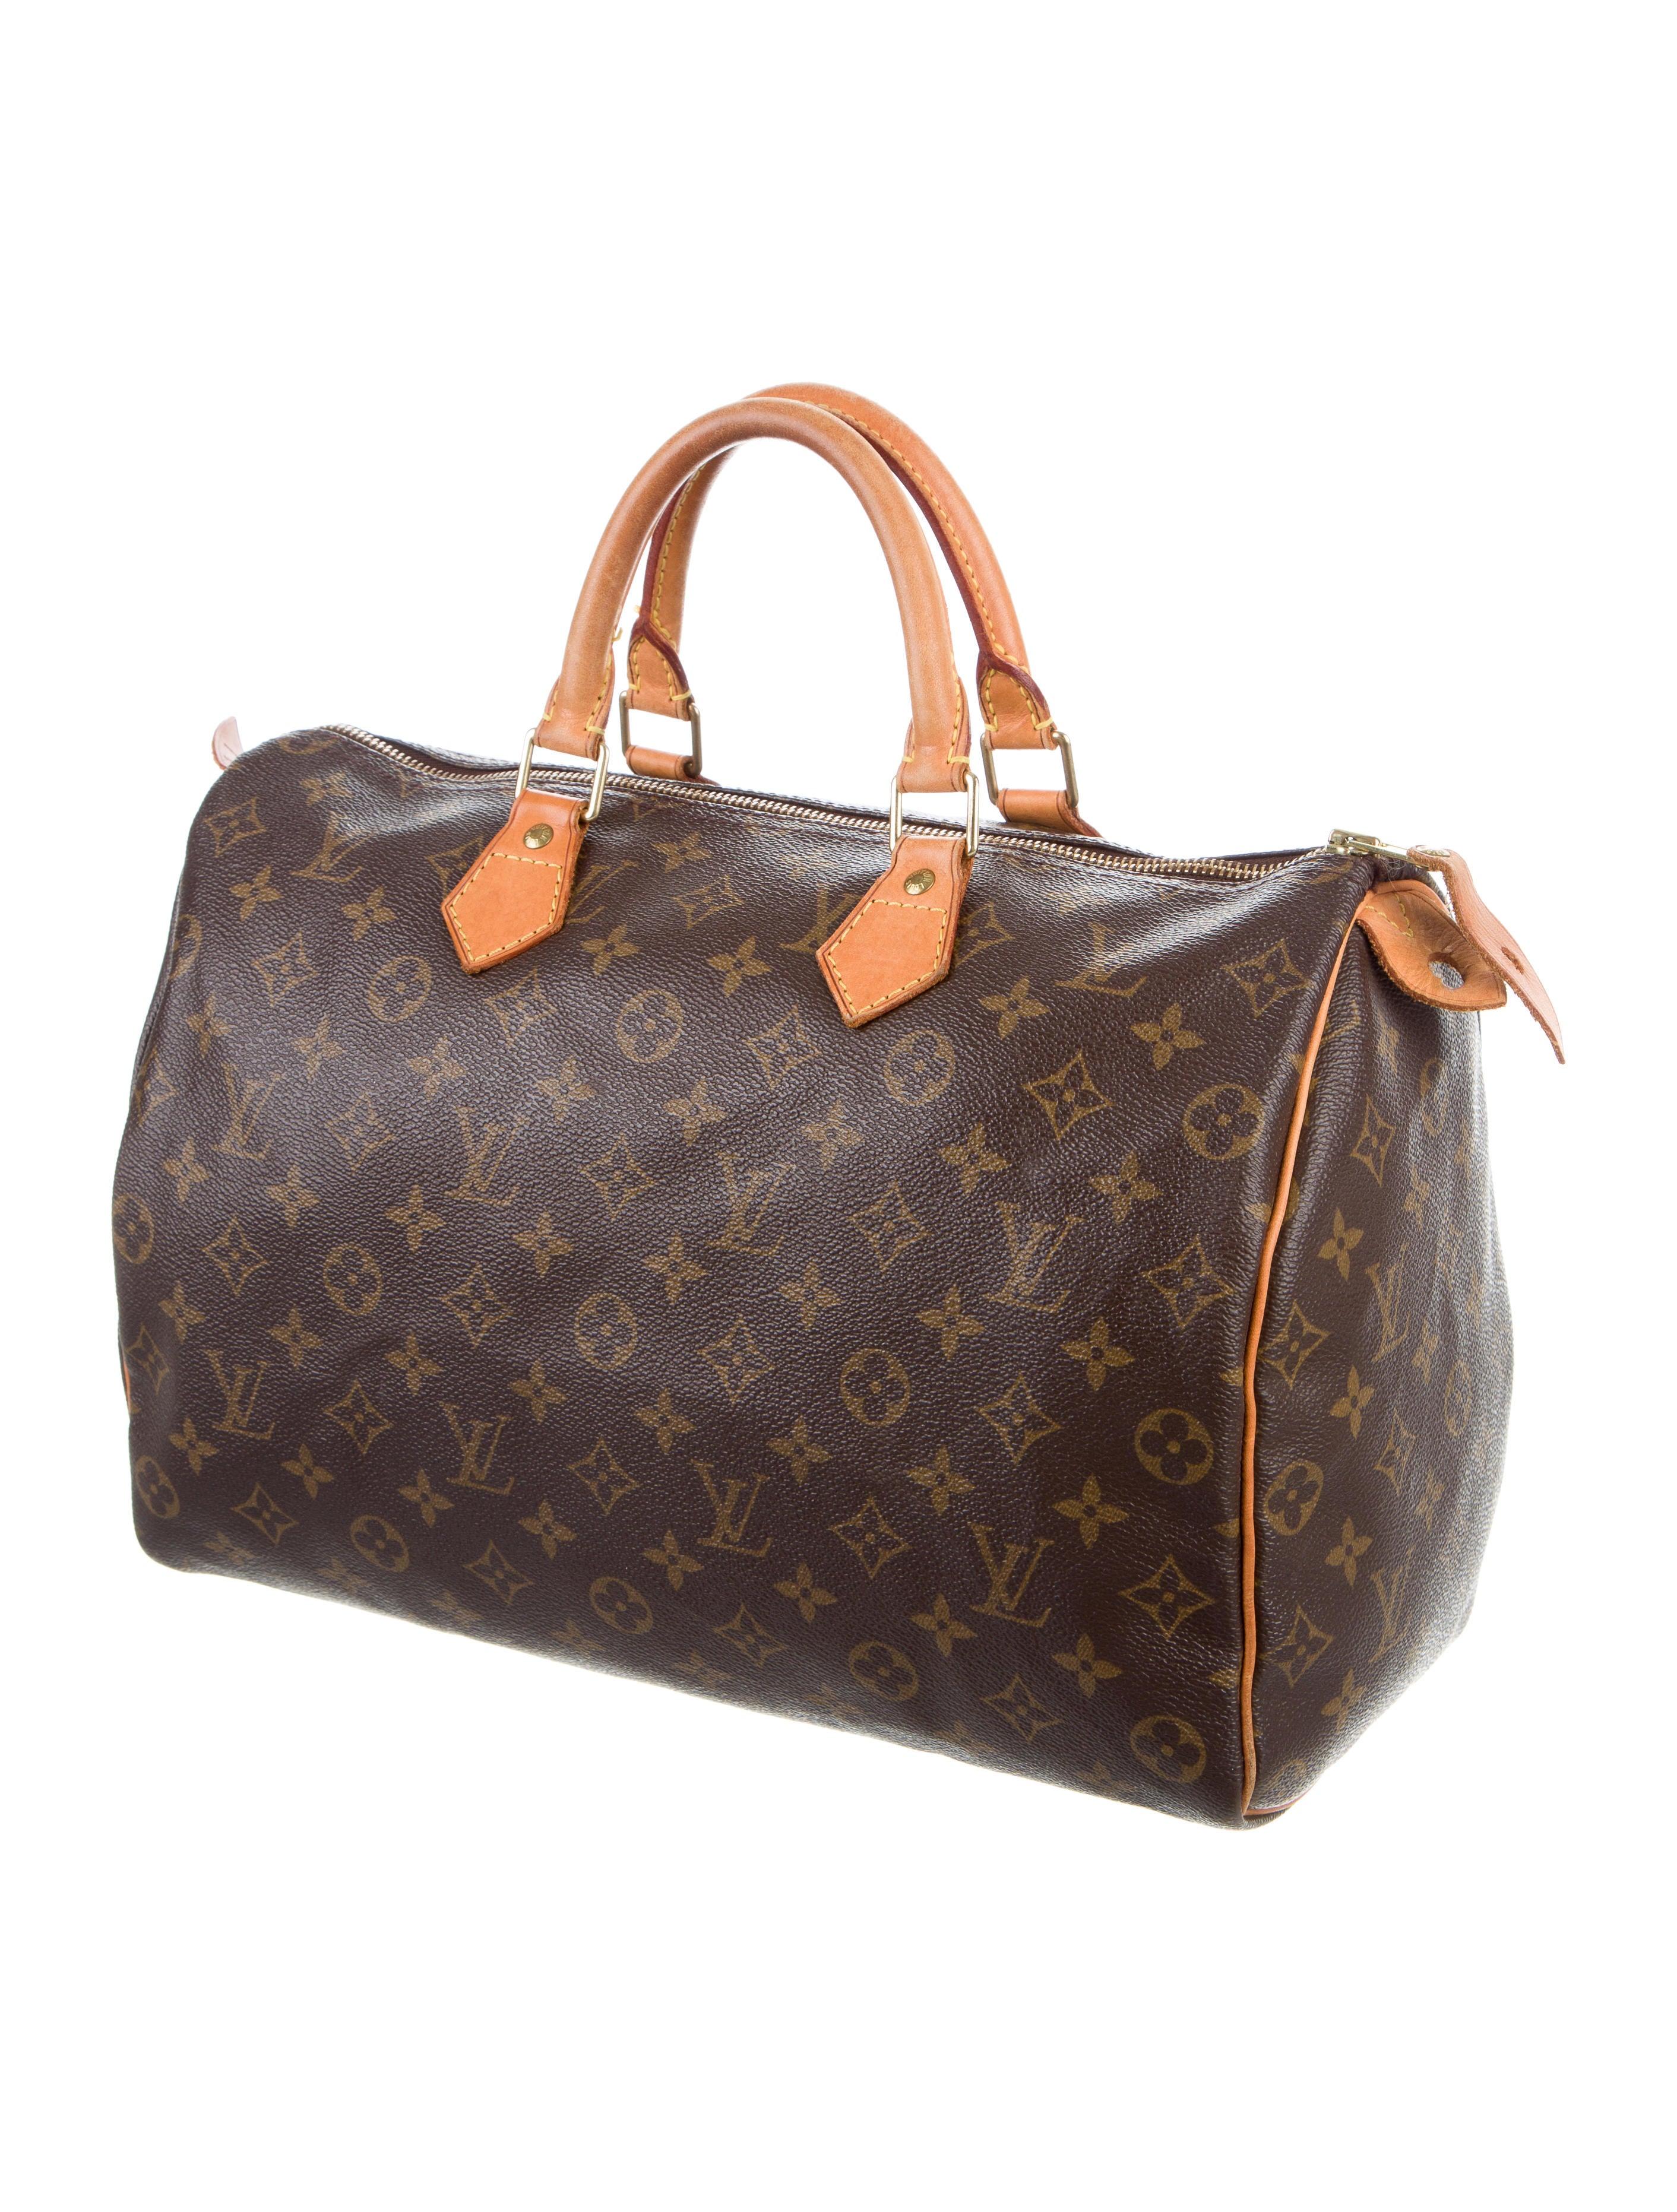 Louis vuitton monogram speedy 35 handbags lou120007 for Louis vuitton miroir speedy 35